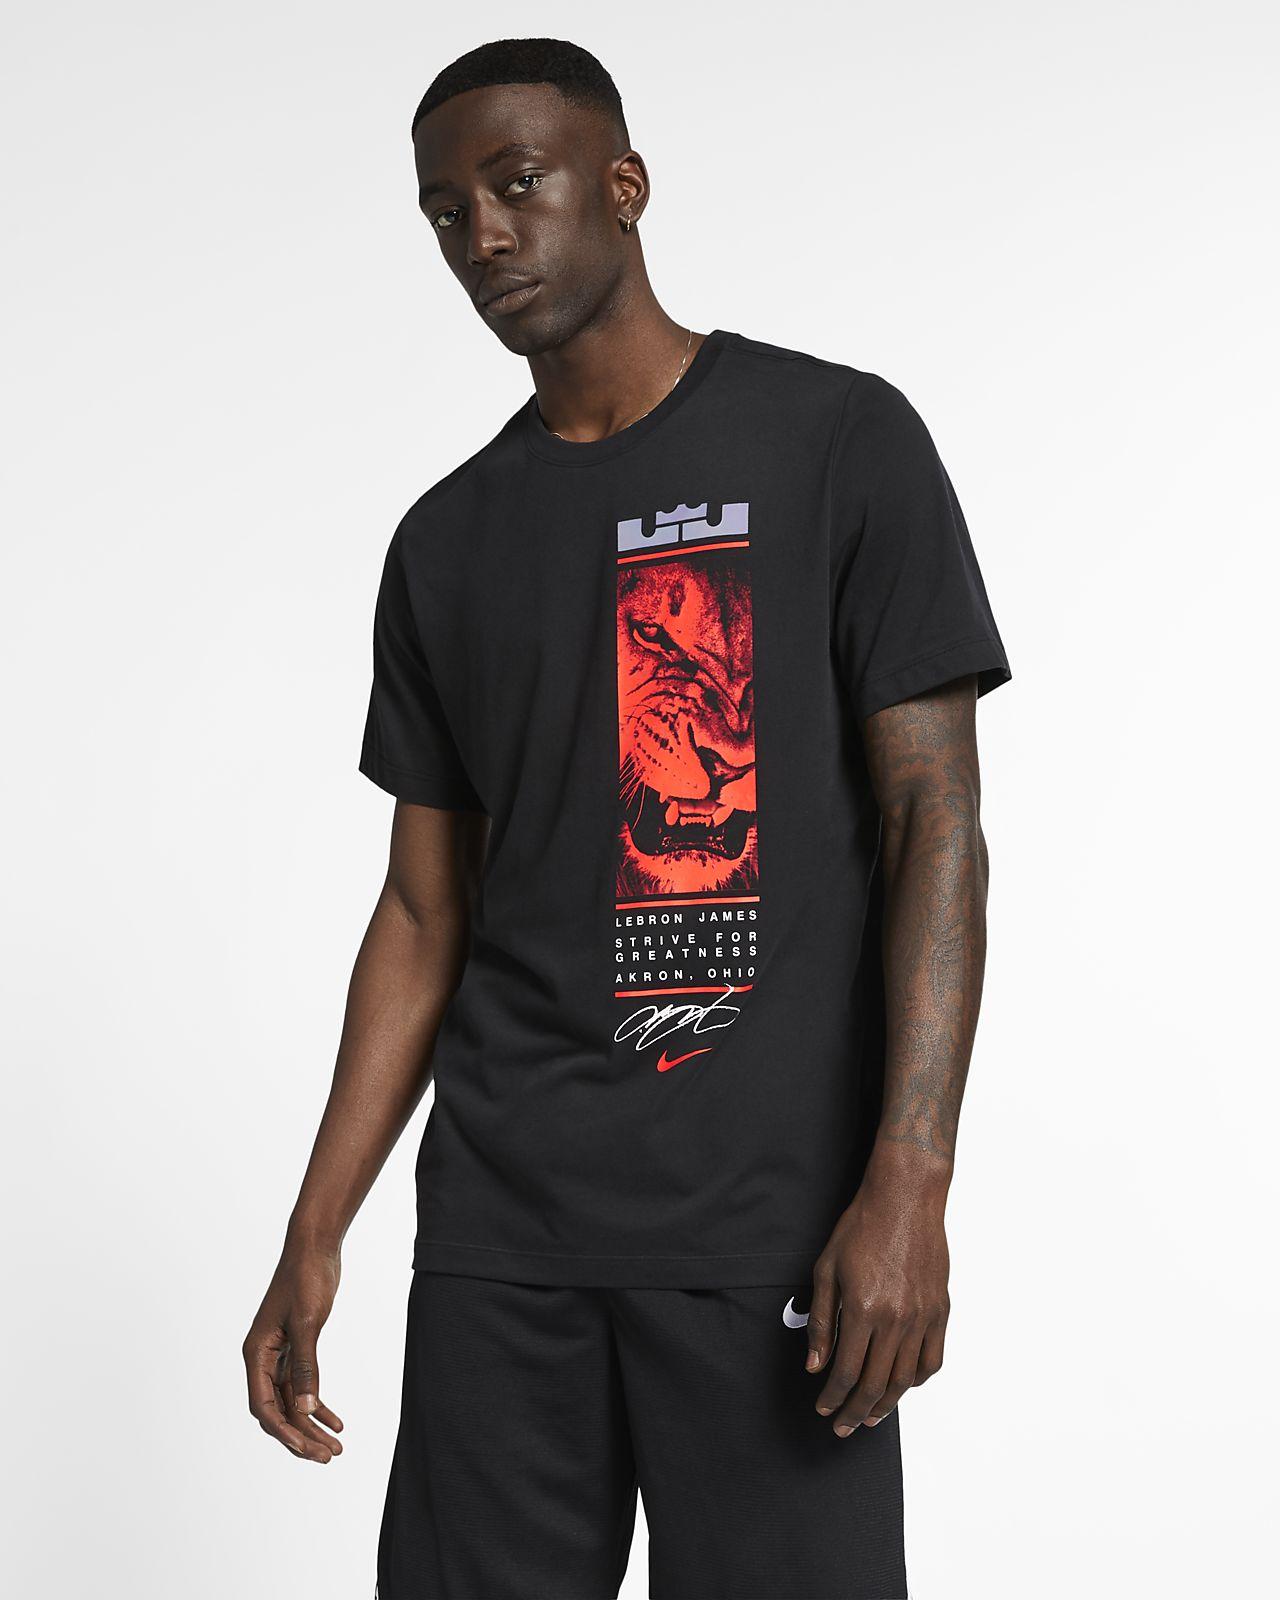 d66c08f5b Nike Dri-FIT LeBron Men's T-Shirt. Nike.com ZA